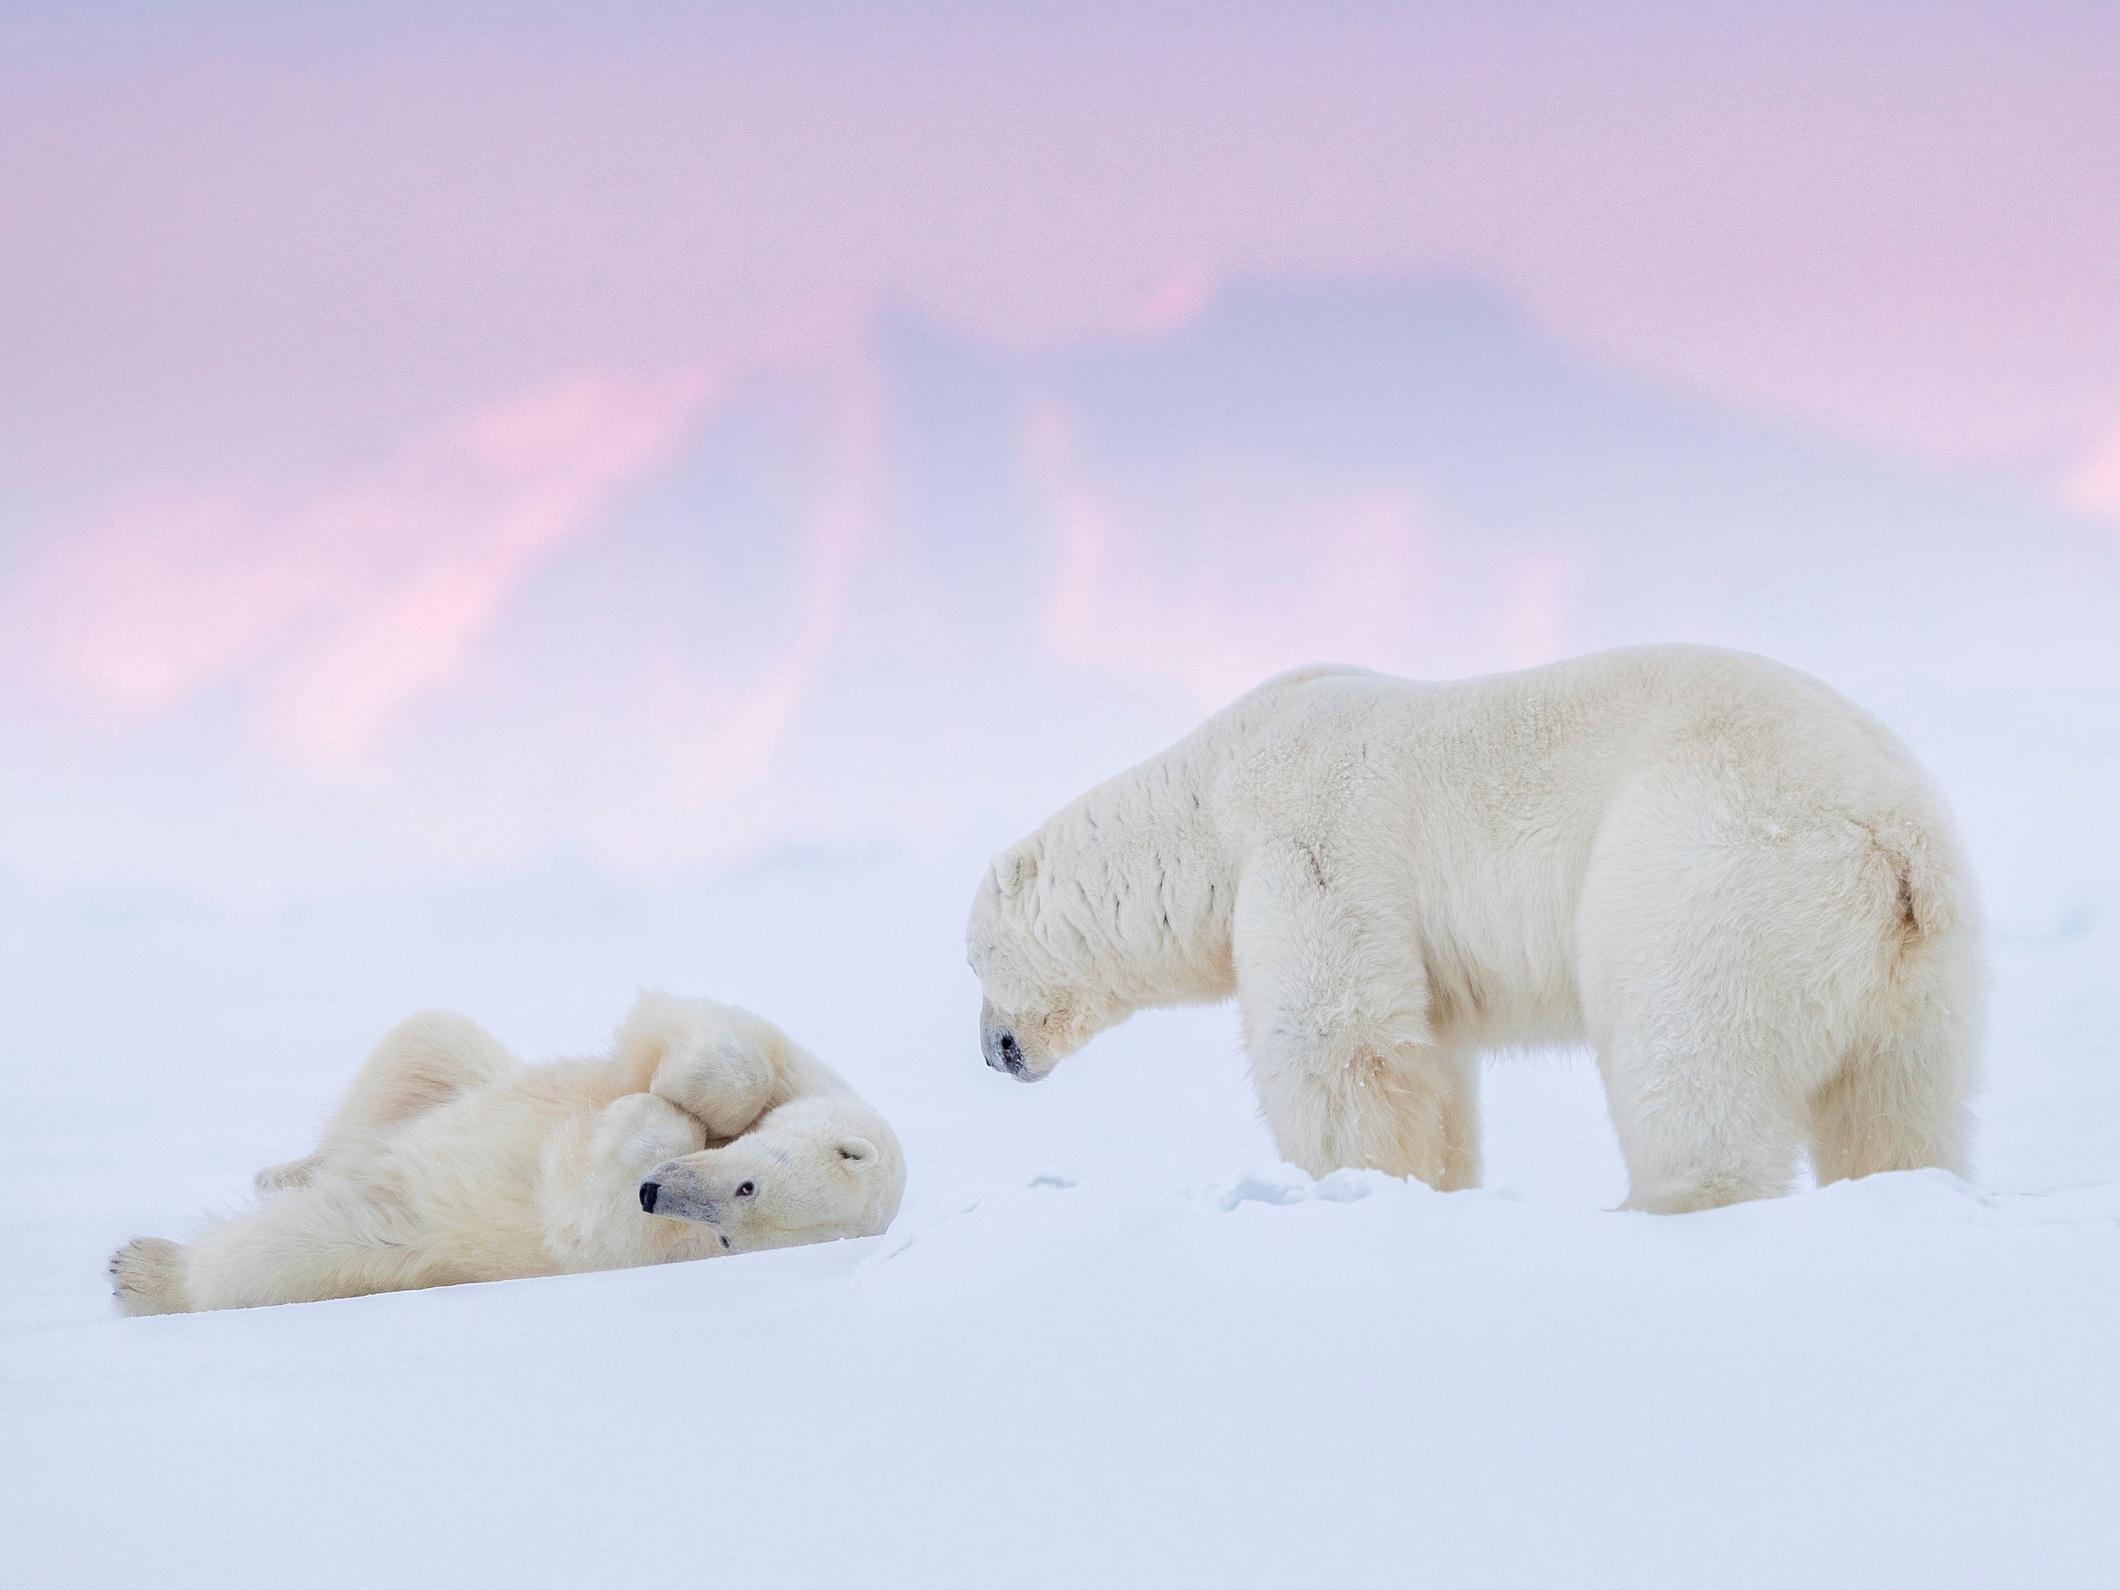 SvalbardWinter2017-16137-Edit-Print-MoabSMR-Perceptual.jpg